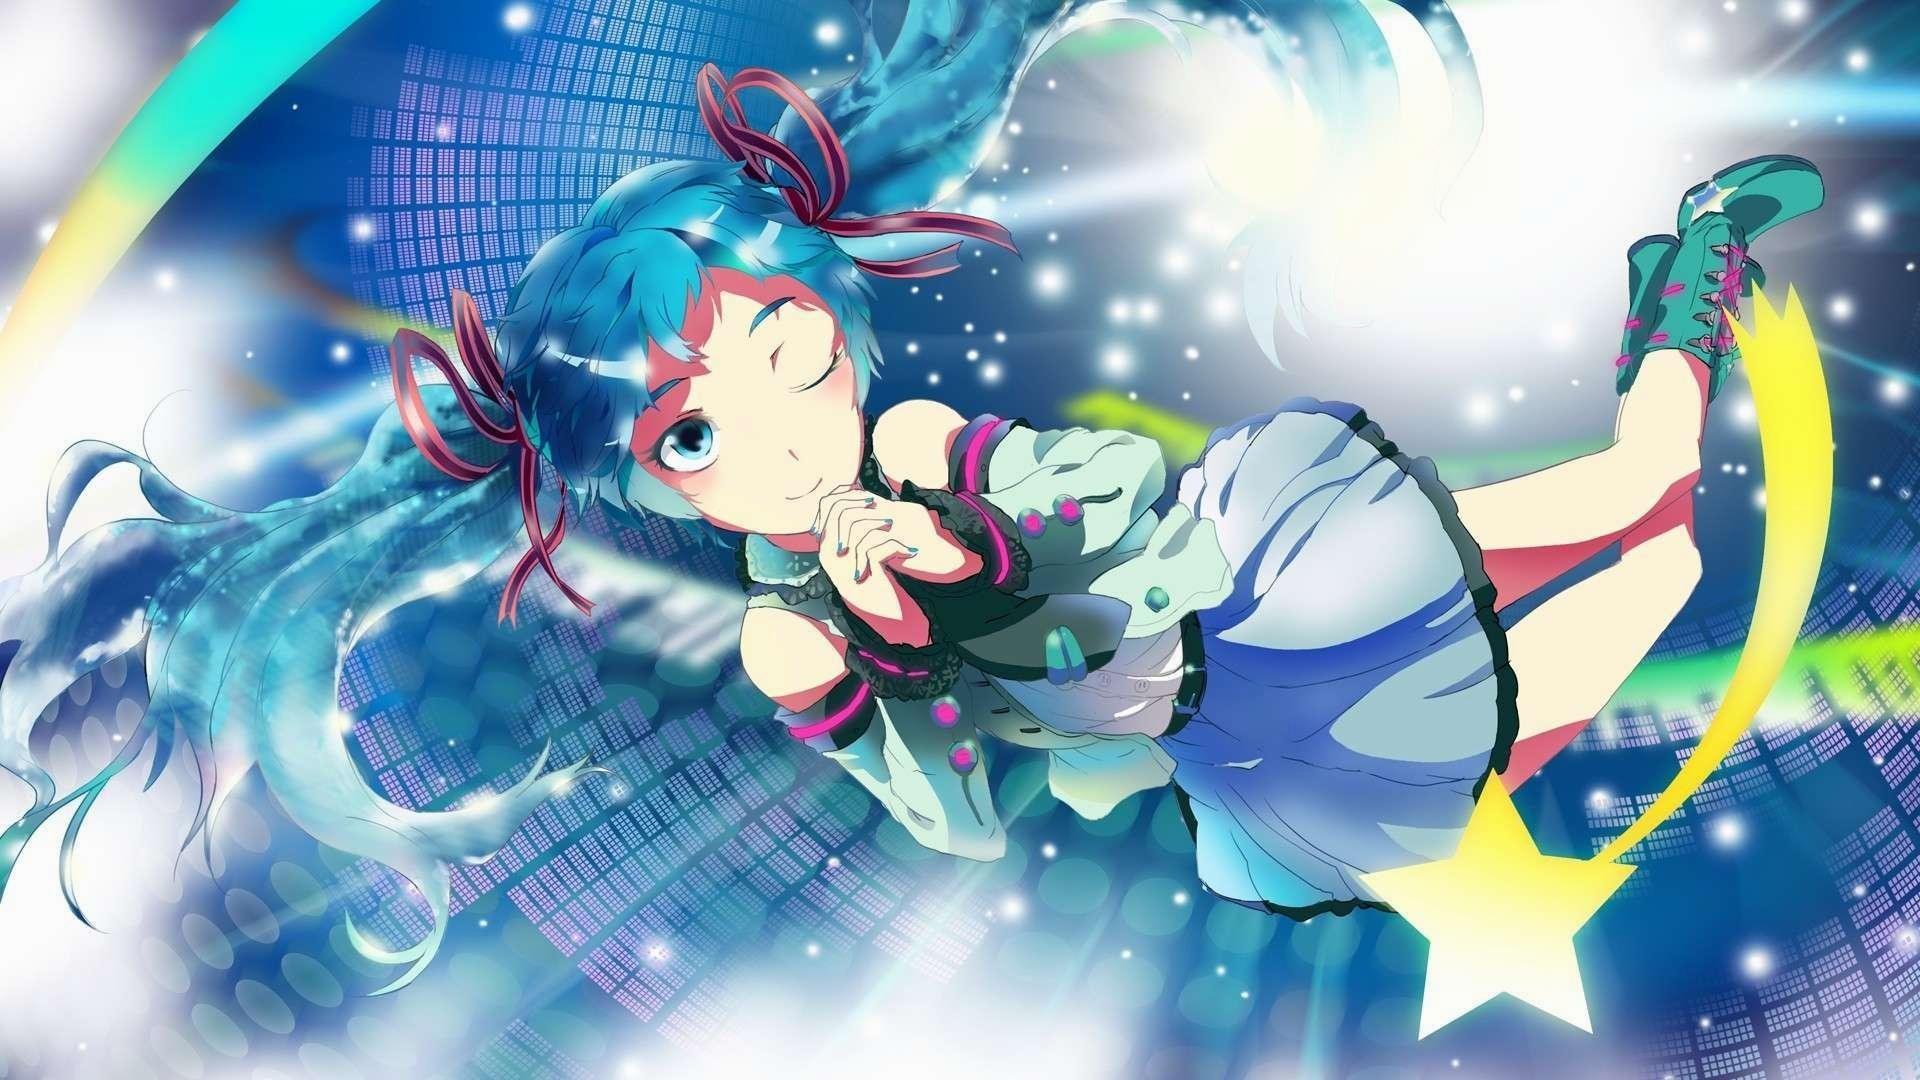 wallpaper.wiki-Download-Free-1080p-Anime-Wallpaper-PIC-